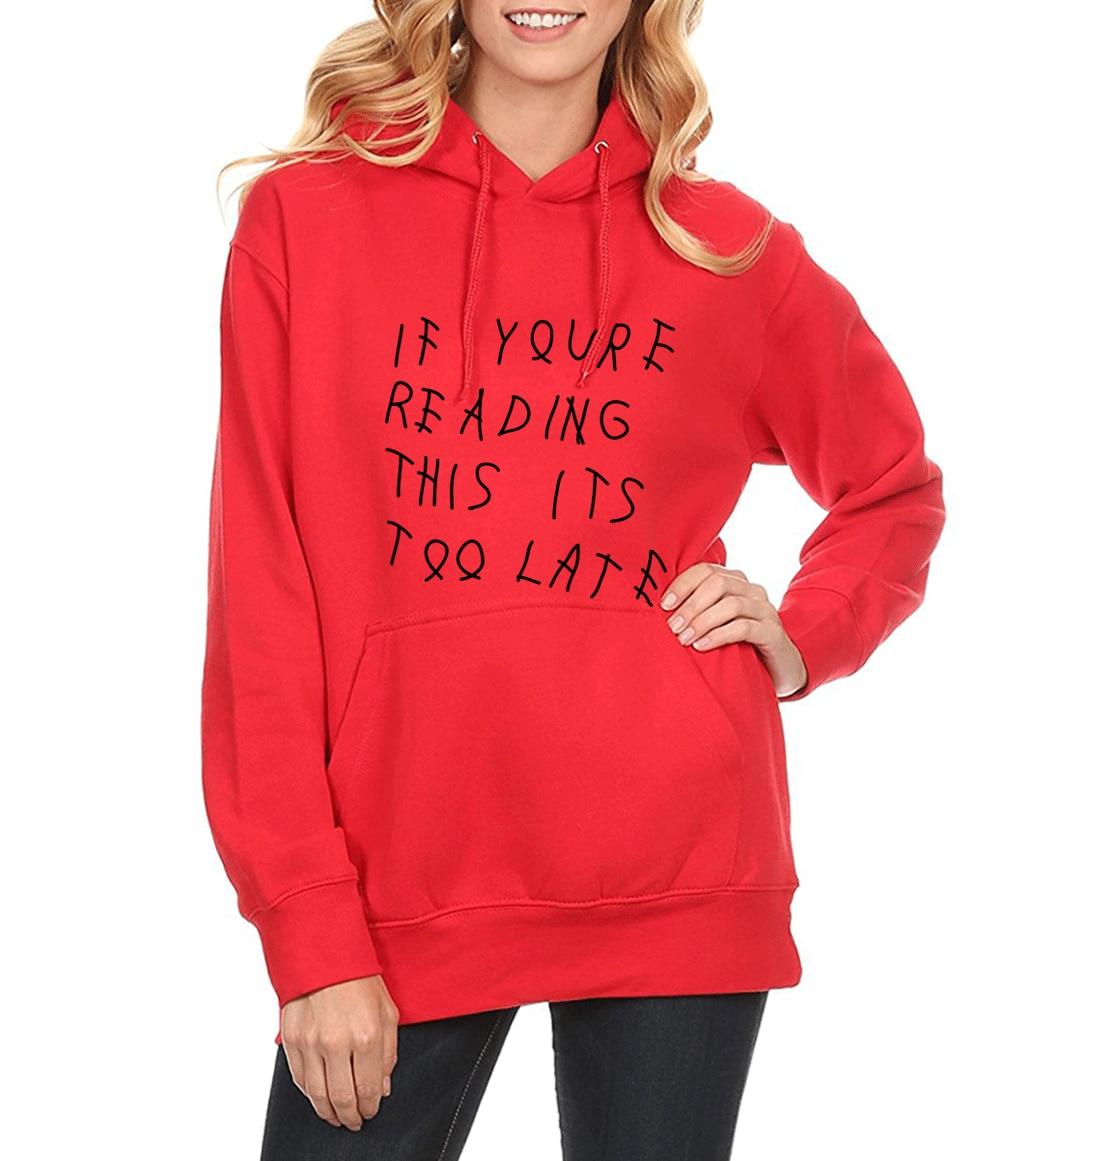 Women's Hoodies Sweatshirts 2019 Spring Fleece Winter Sweatshirt For Women Hoody if you're reading this its too late Funny Print